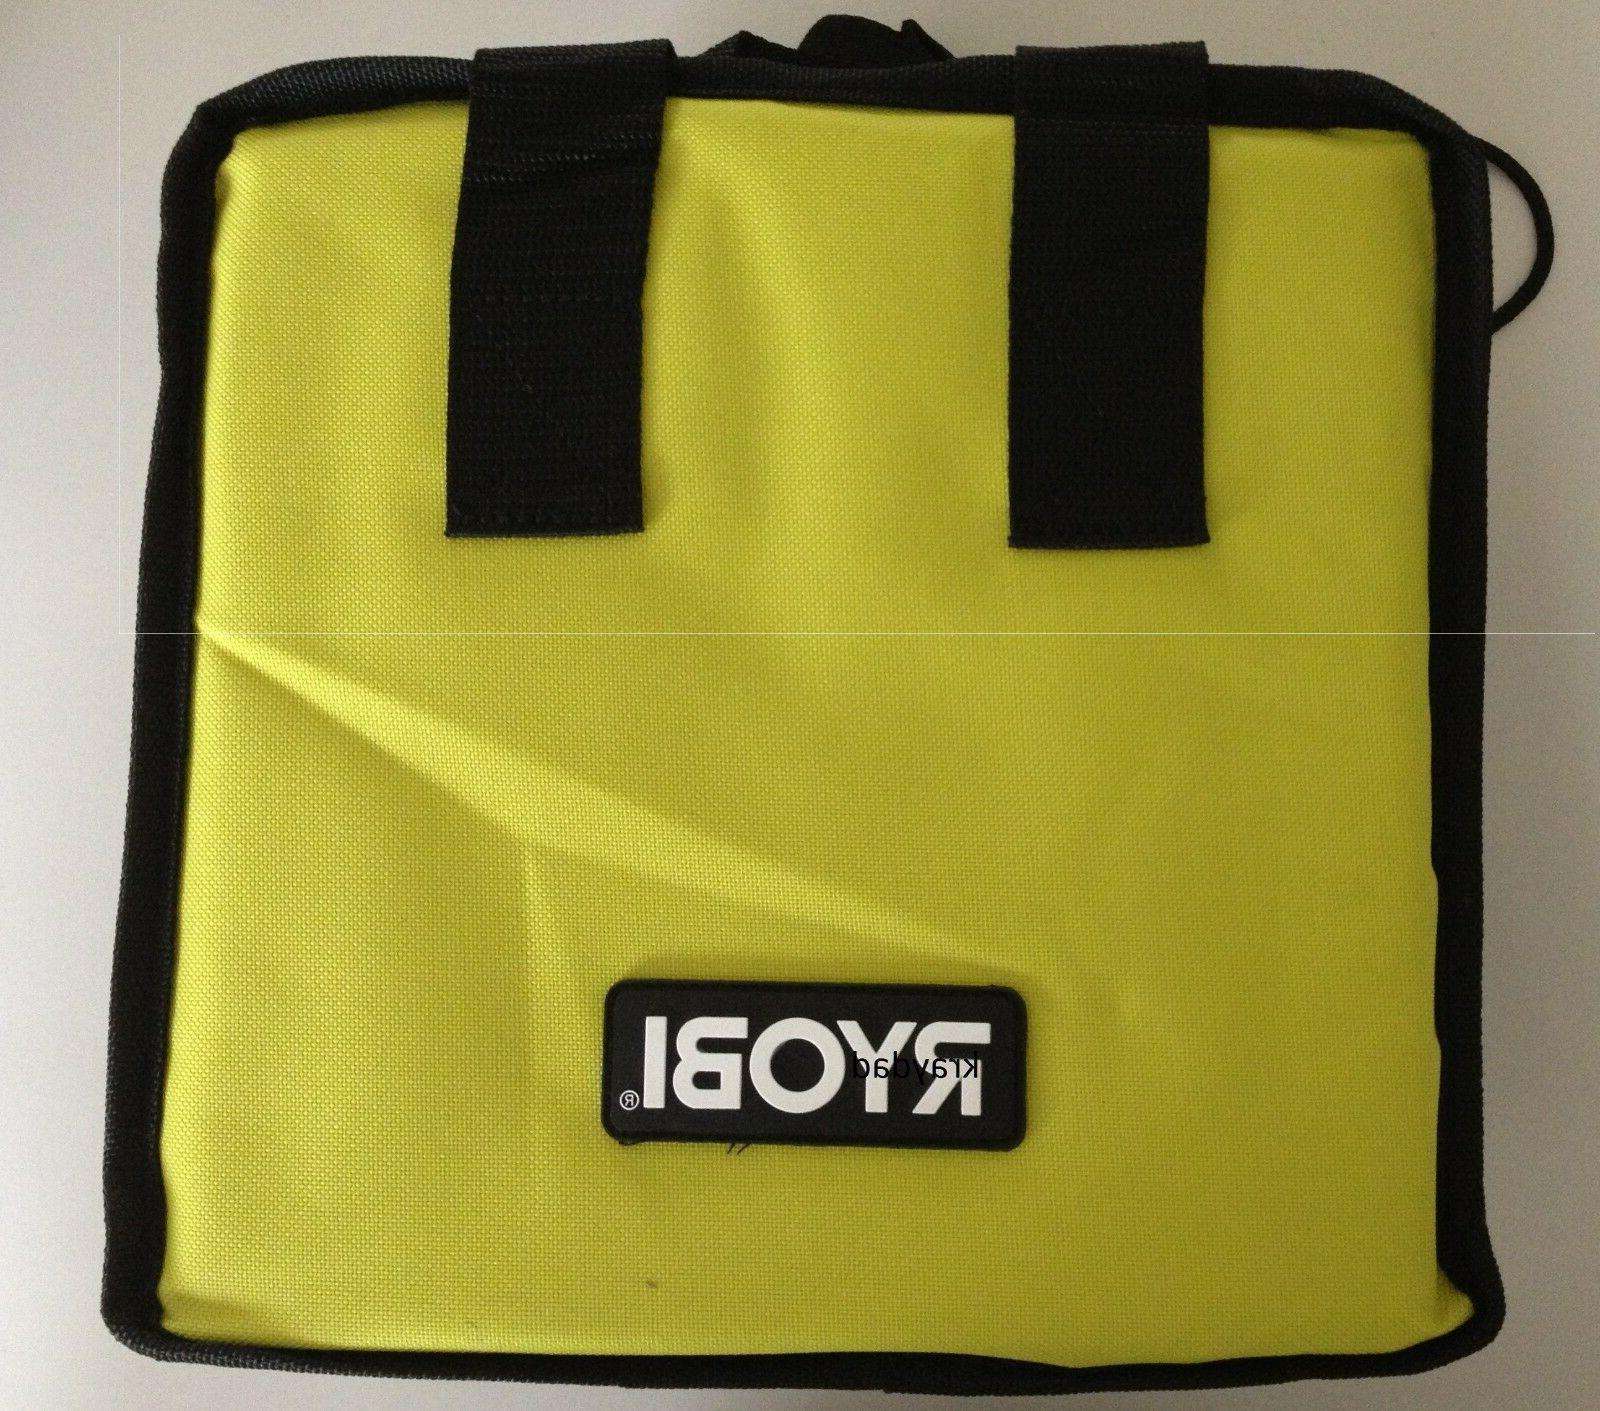 NEW RYOBI Tool Bag 10 X 10 X 6 inches For Drill / Impact Dri